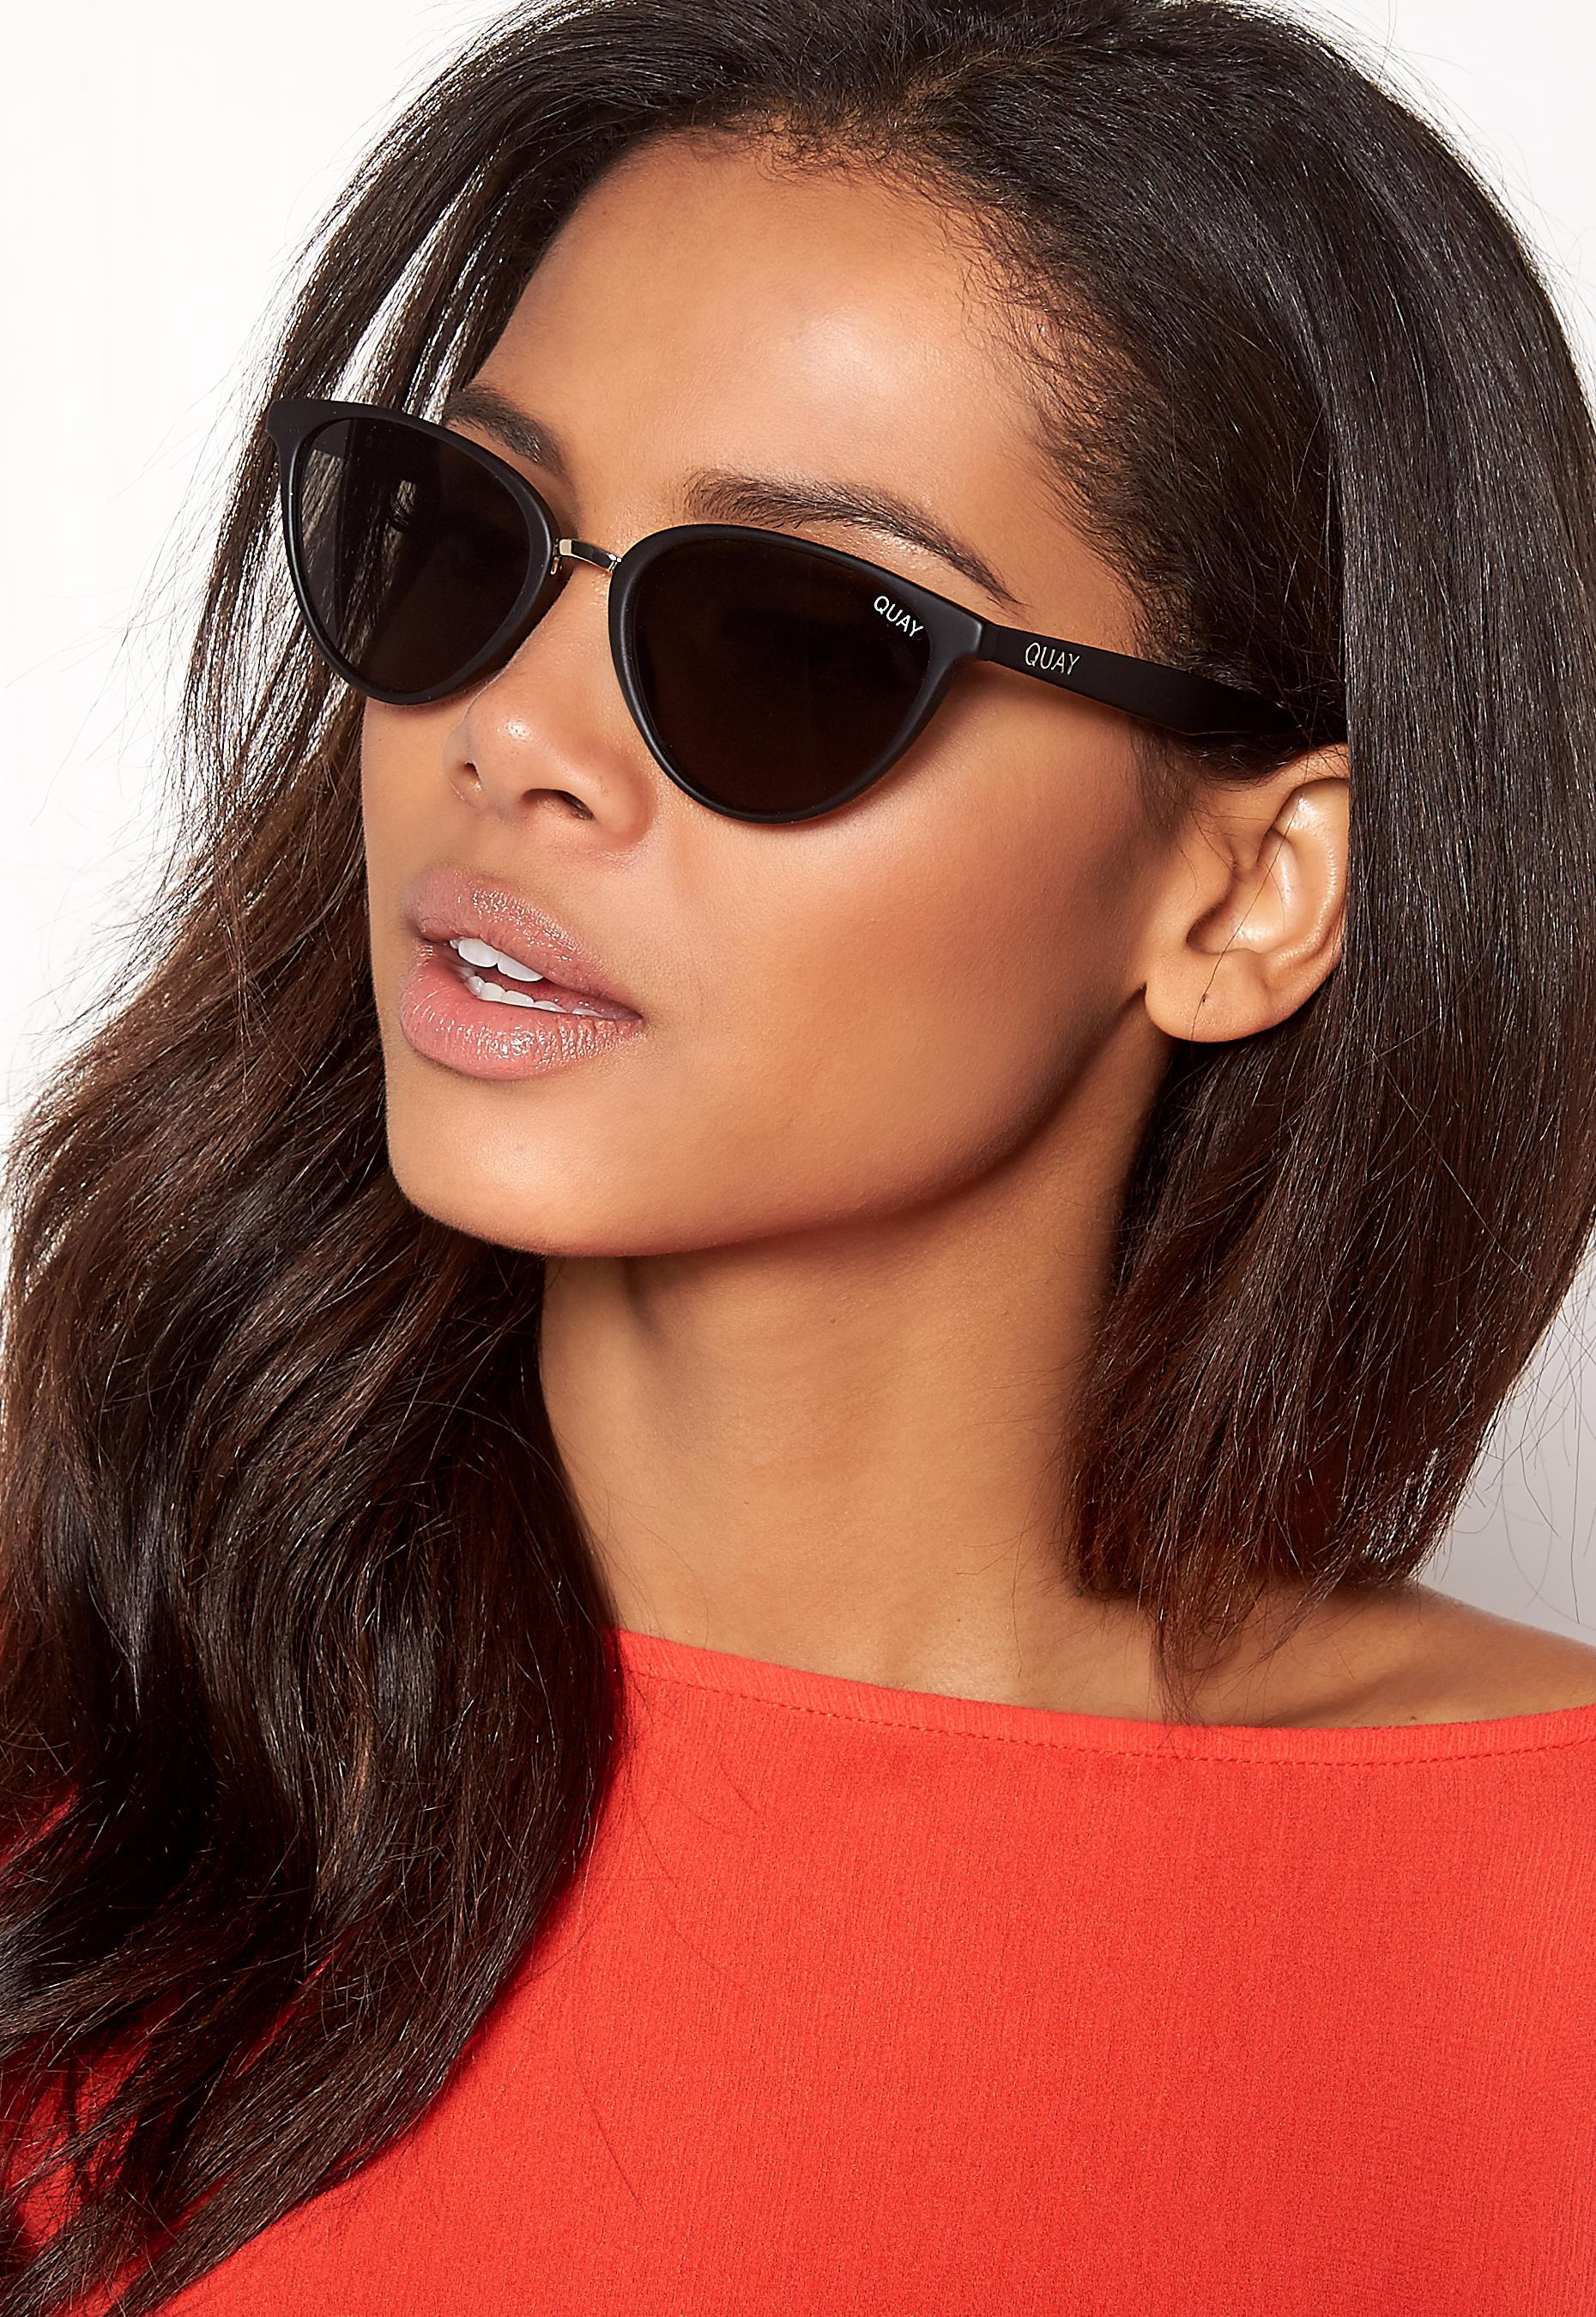 72805a9b8c13a Quay Australia Rumours Sunglasses Black Smoke Lens - Bubbleroom